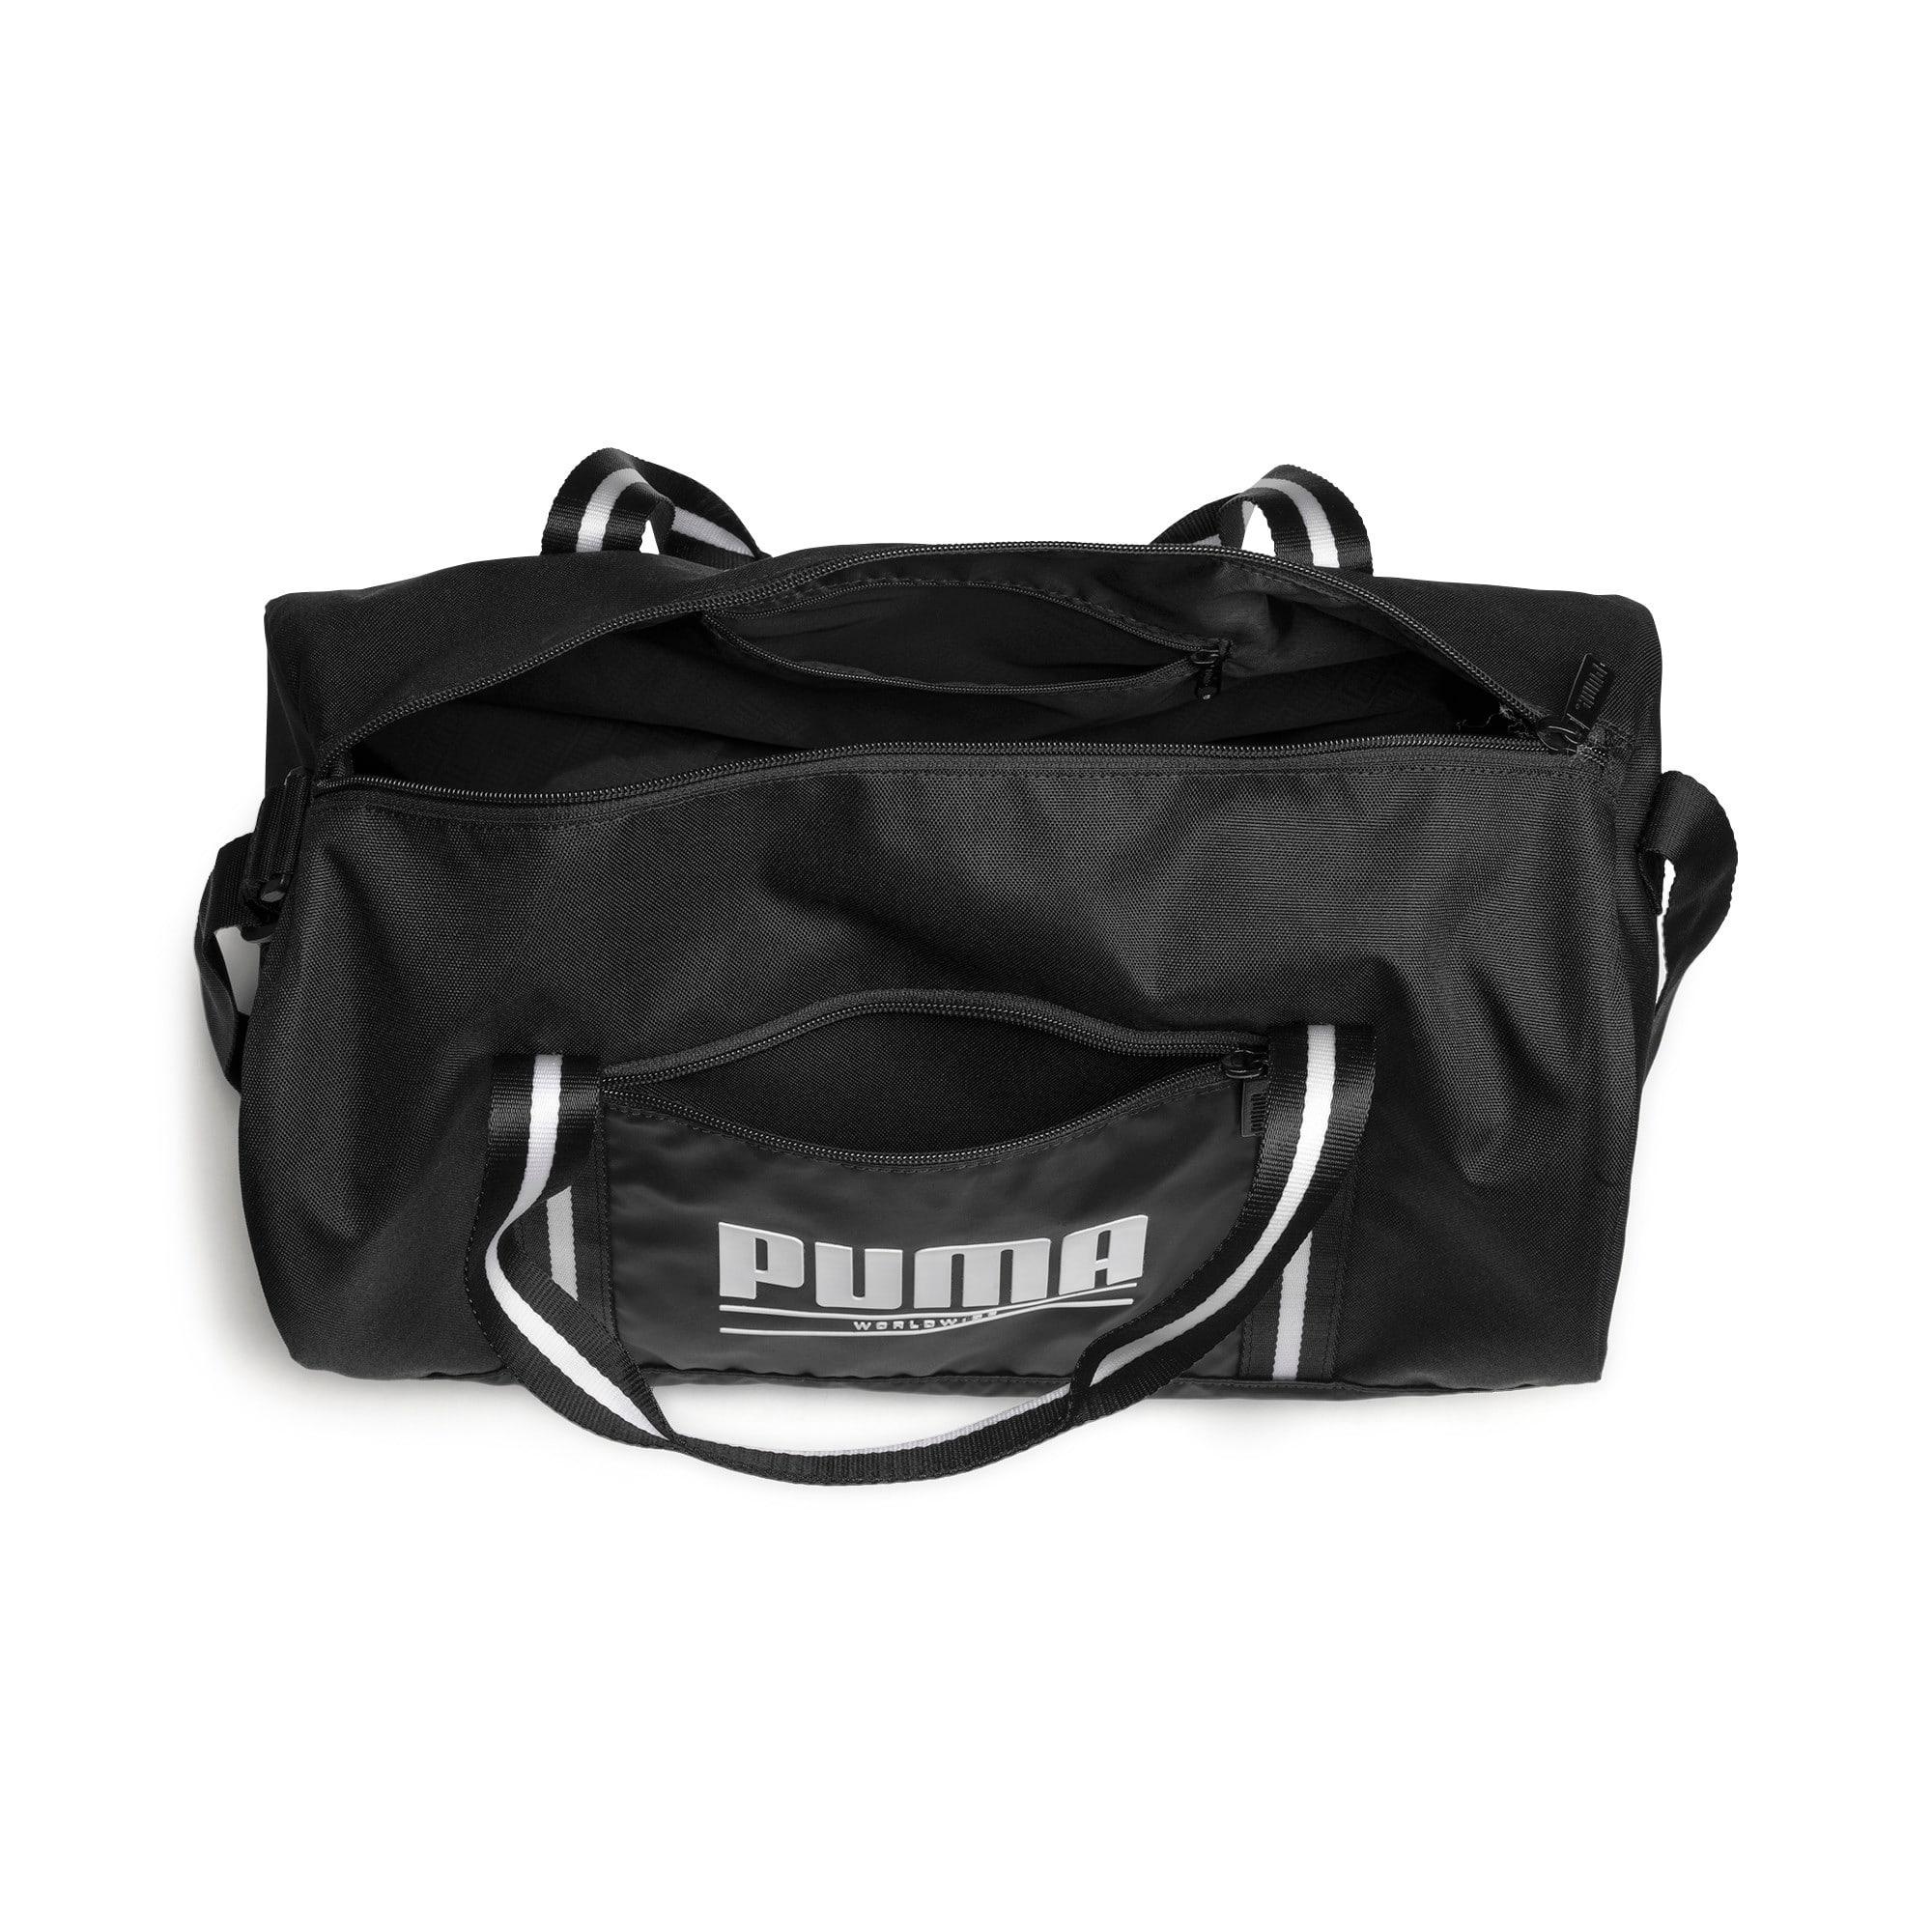 Thumbnail 4 of Core Base Barrel Bag, Puma Black, medium